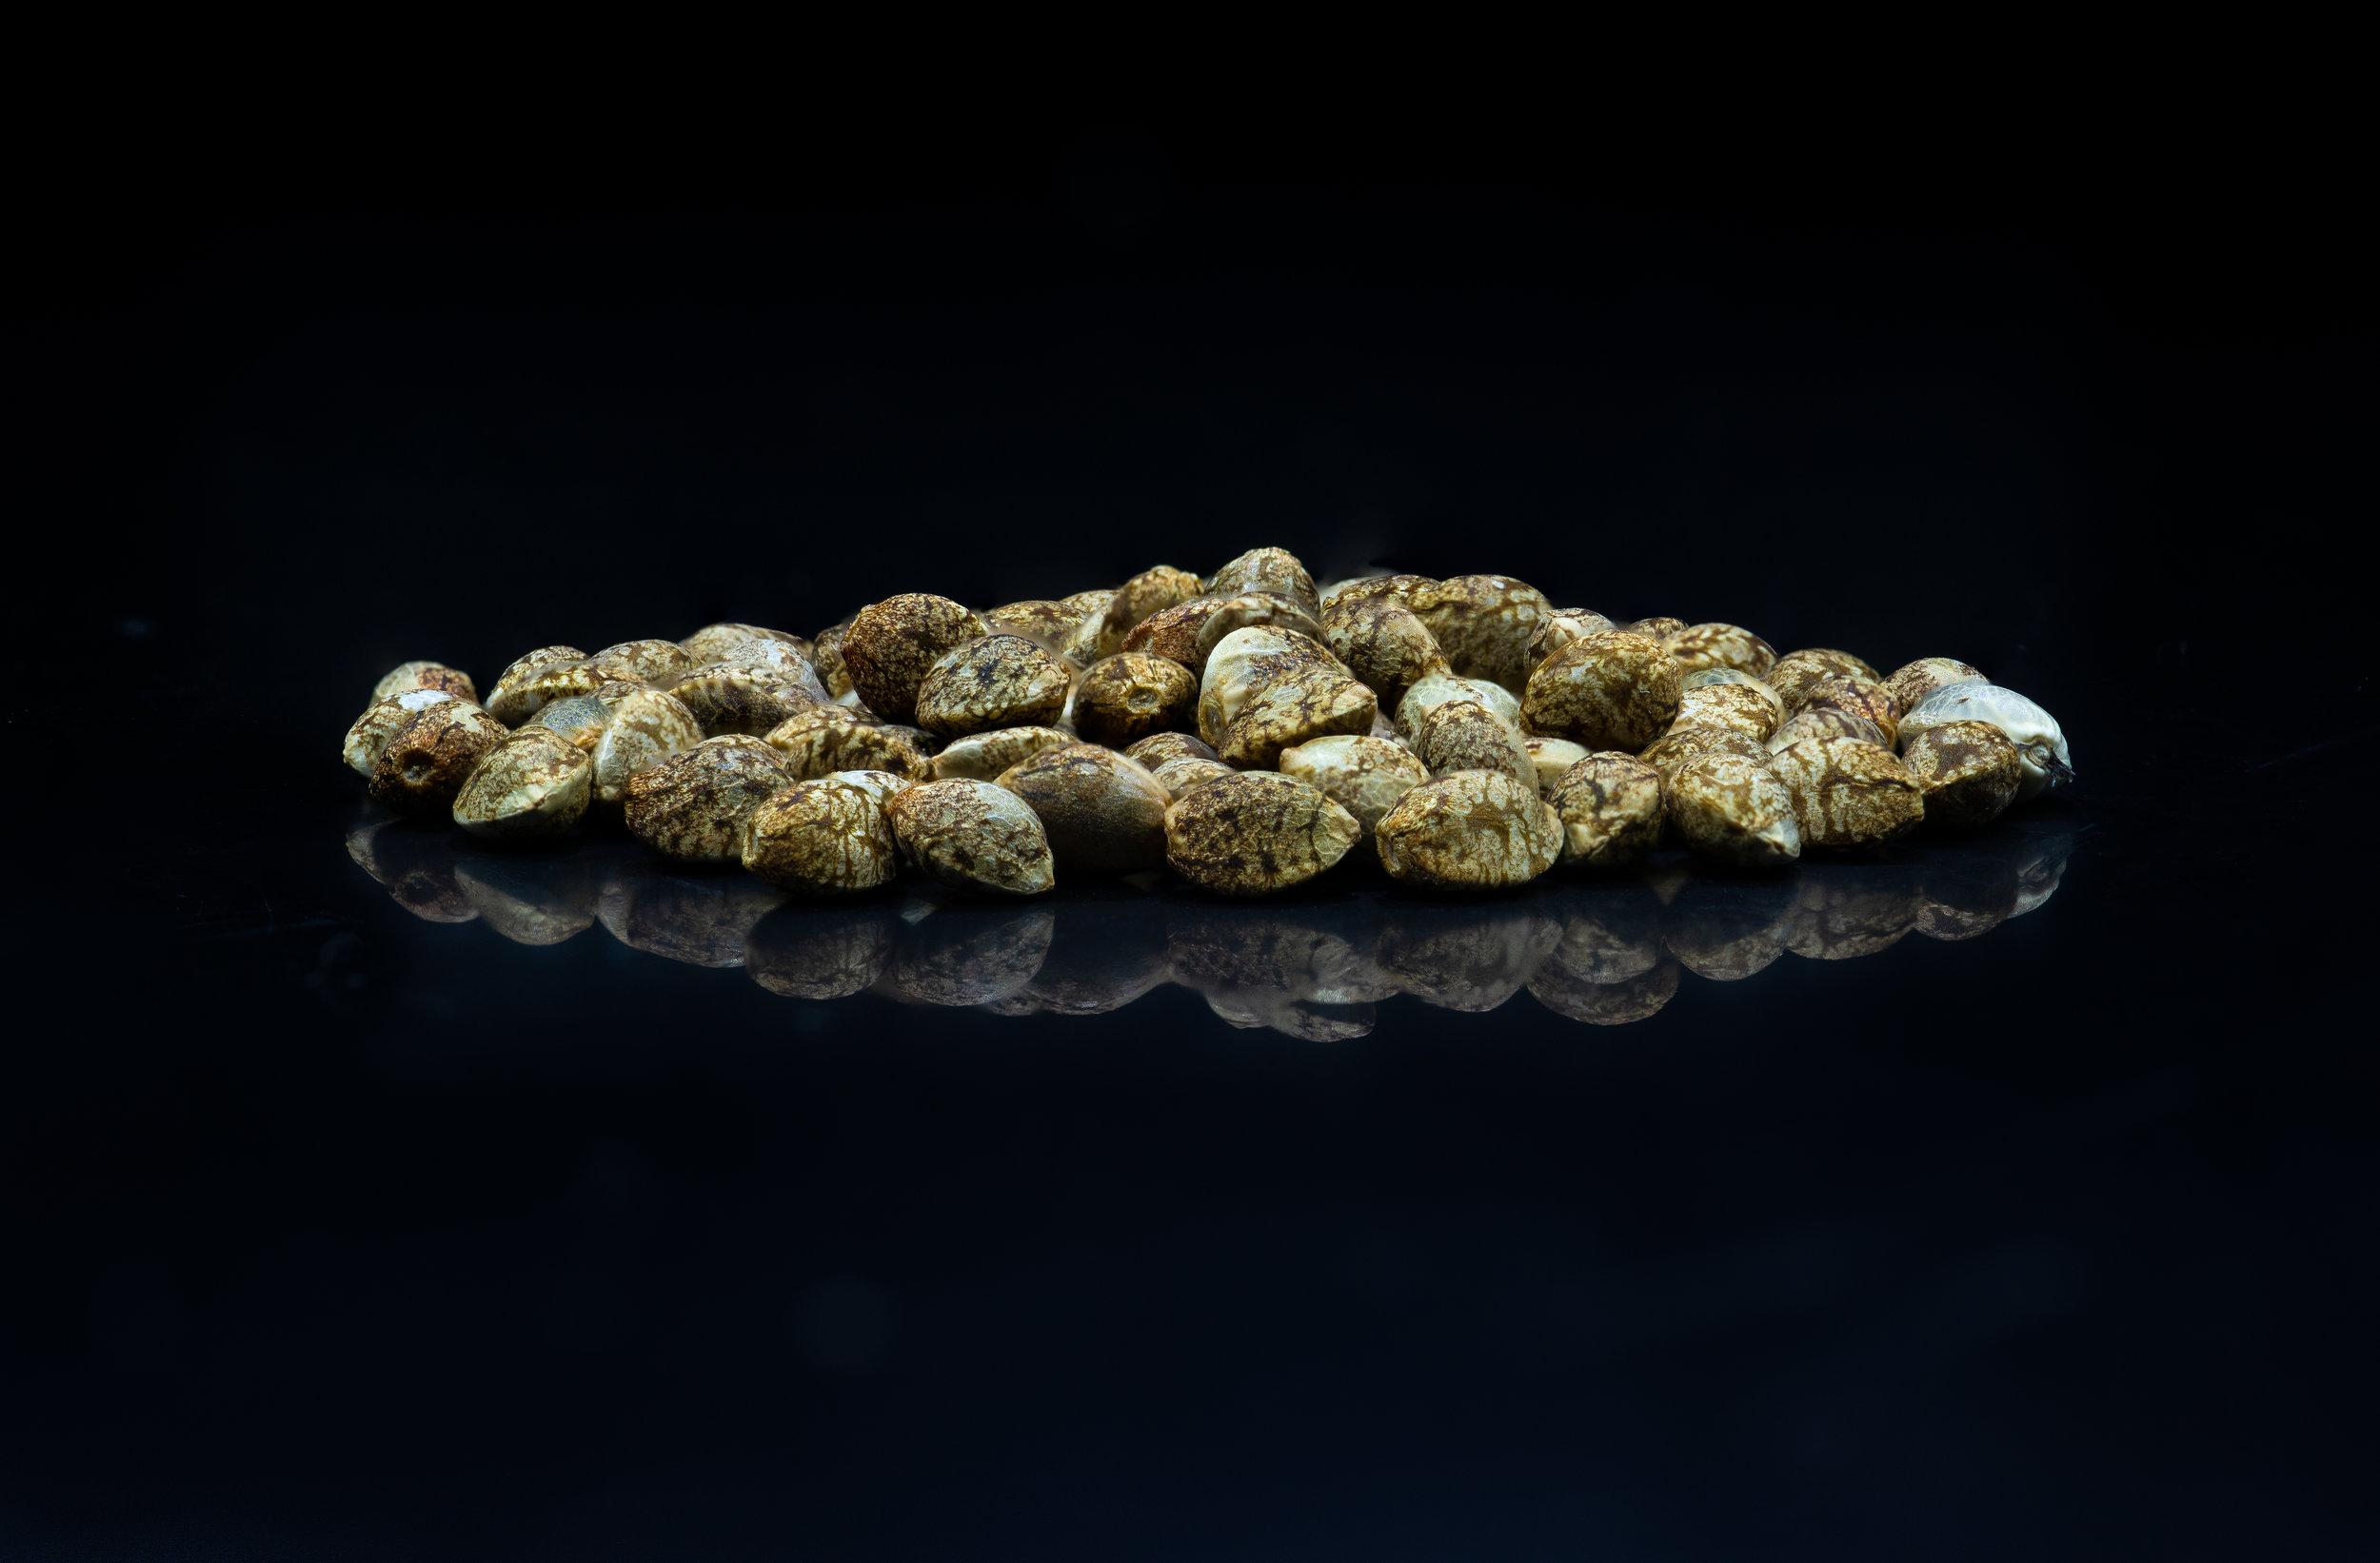 Island of seeds